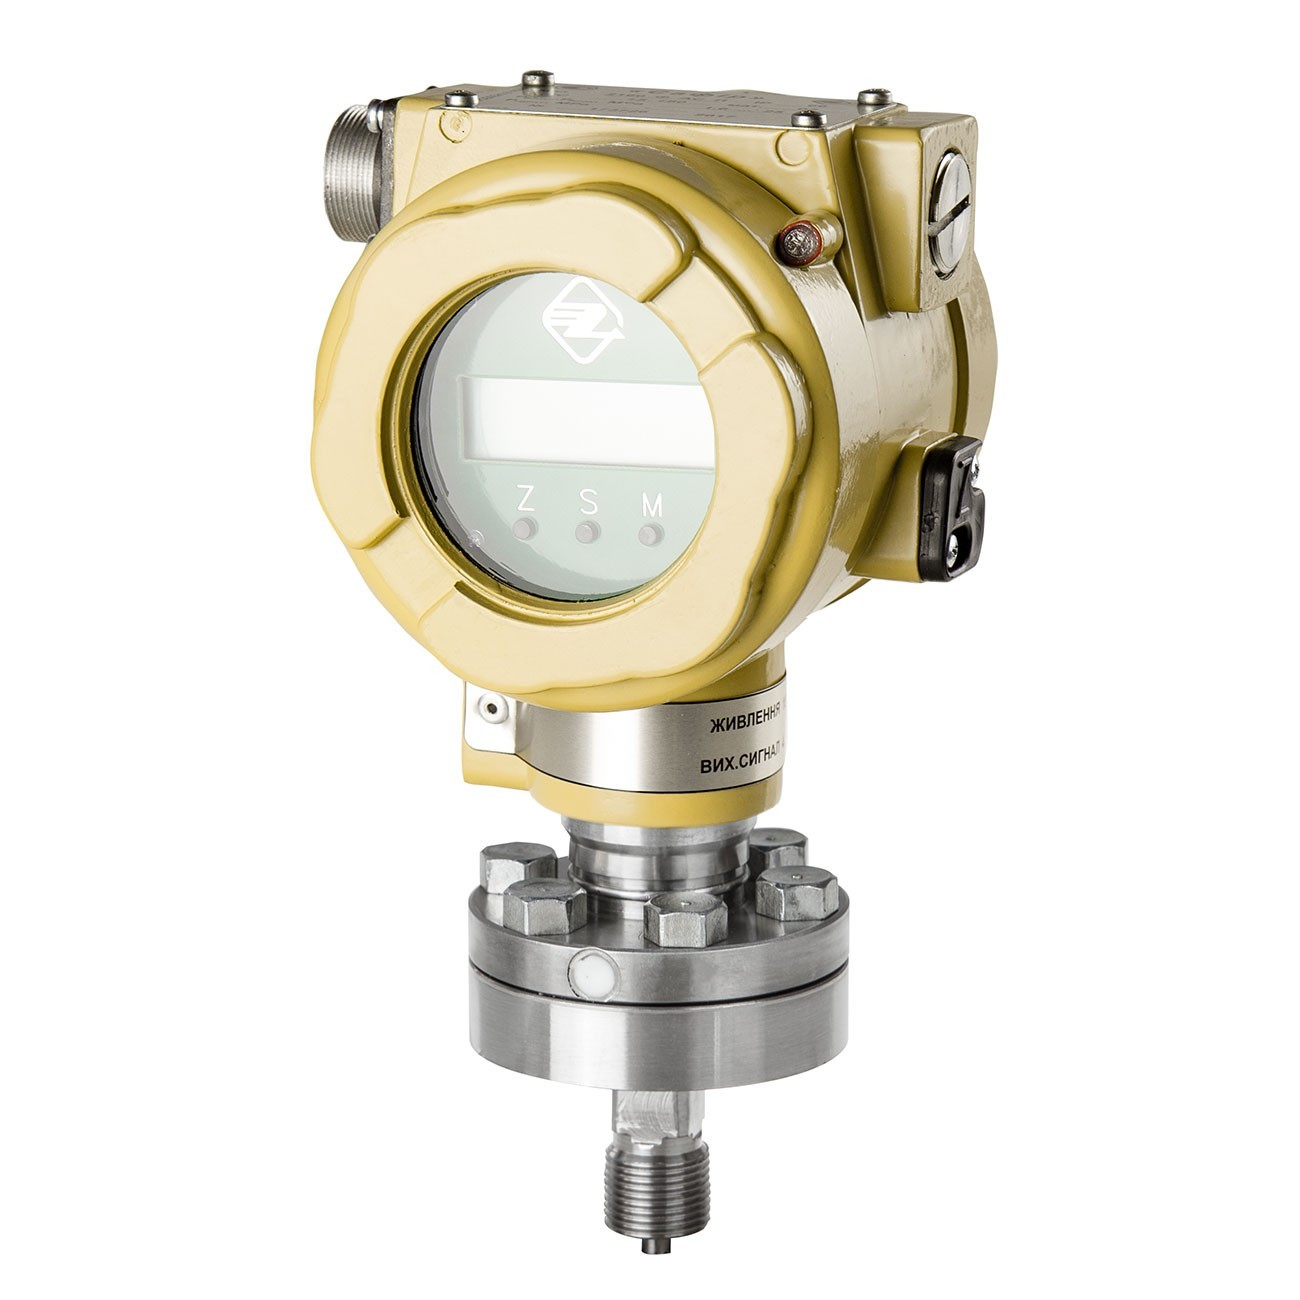 Digital Gauge Pressure Transmitters Safir 2172 F